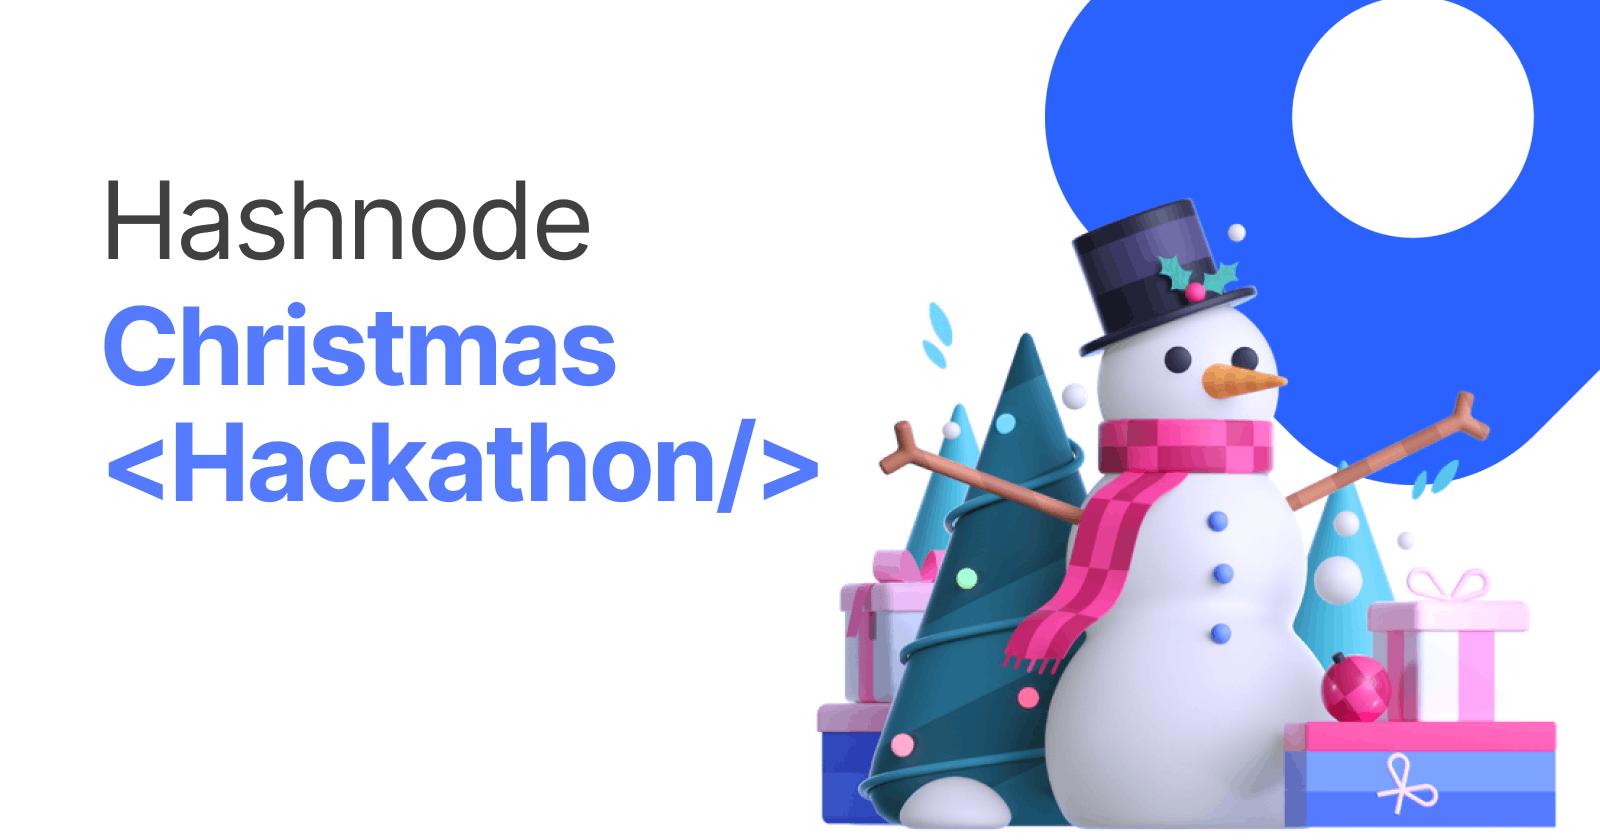 Hashnode Christmas Hackathon!